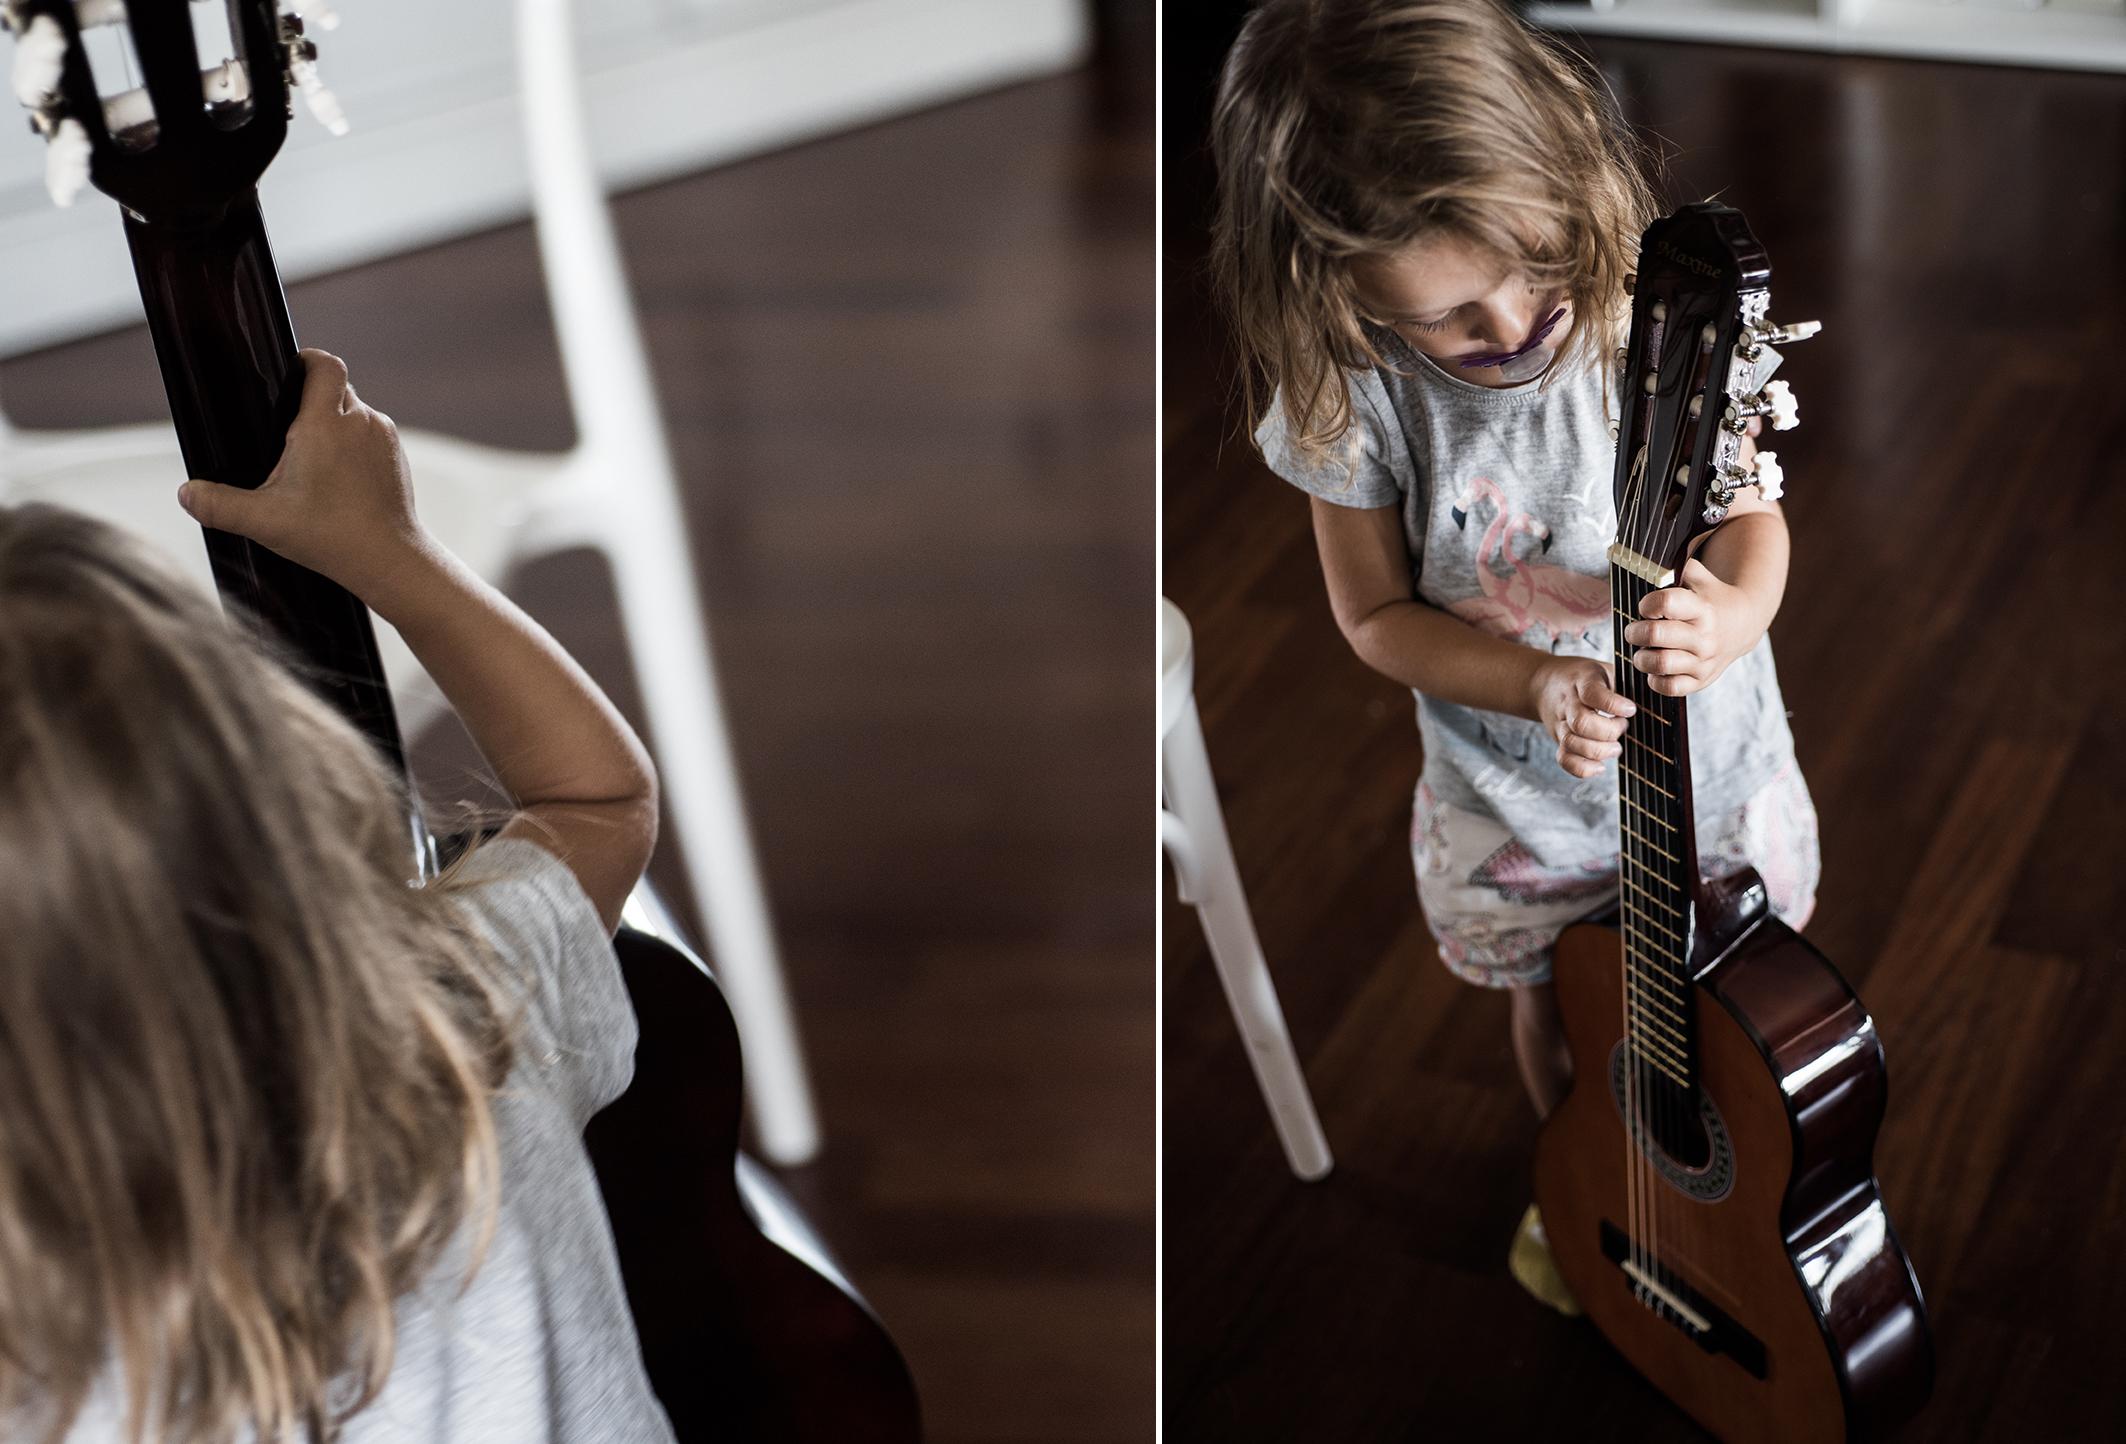 isabella_guitar.jpg